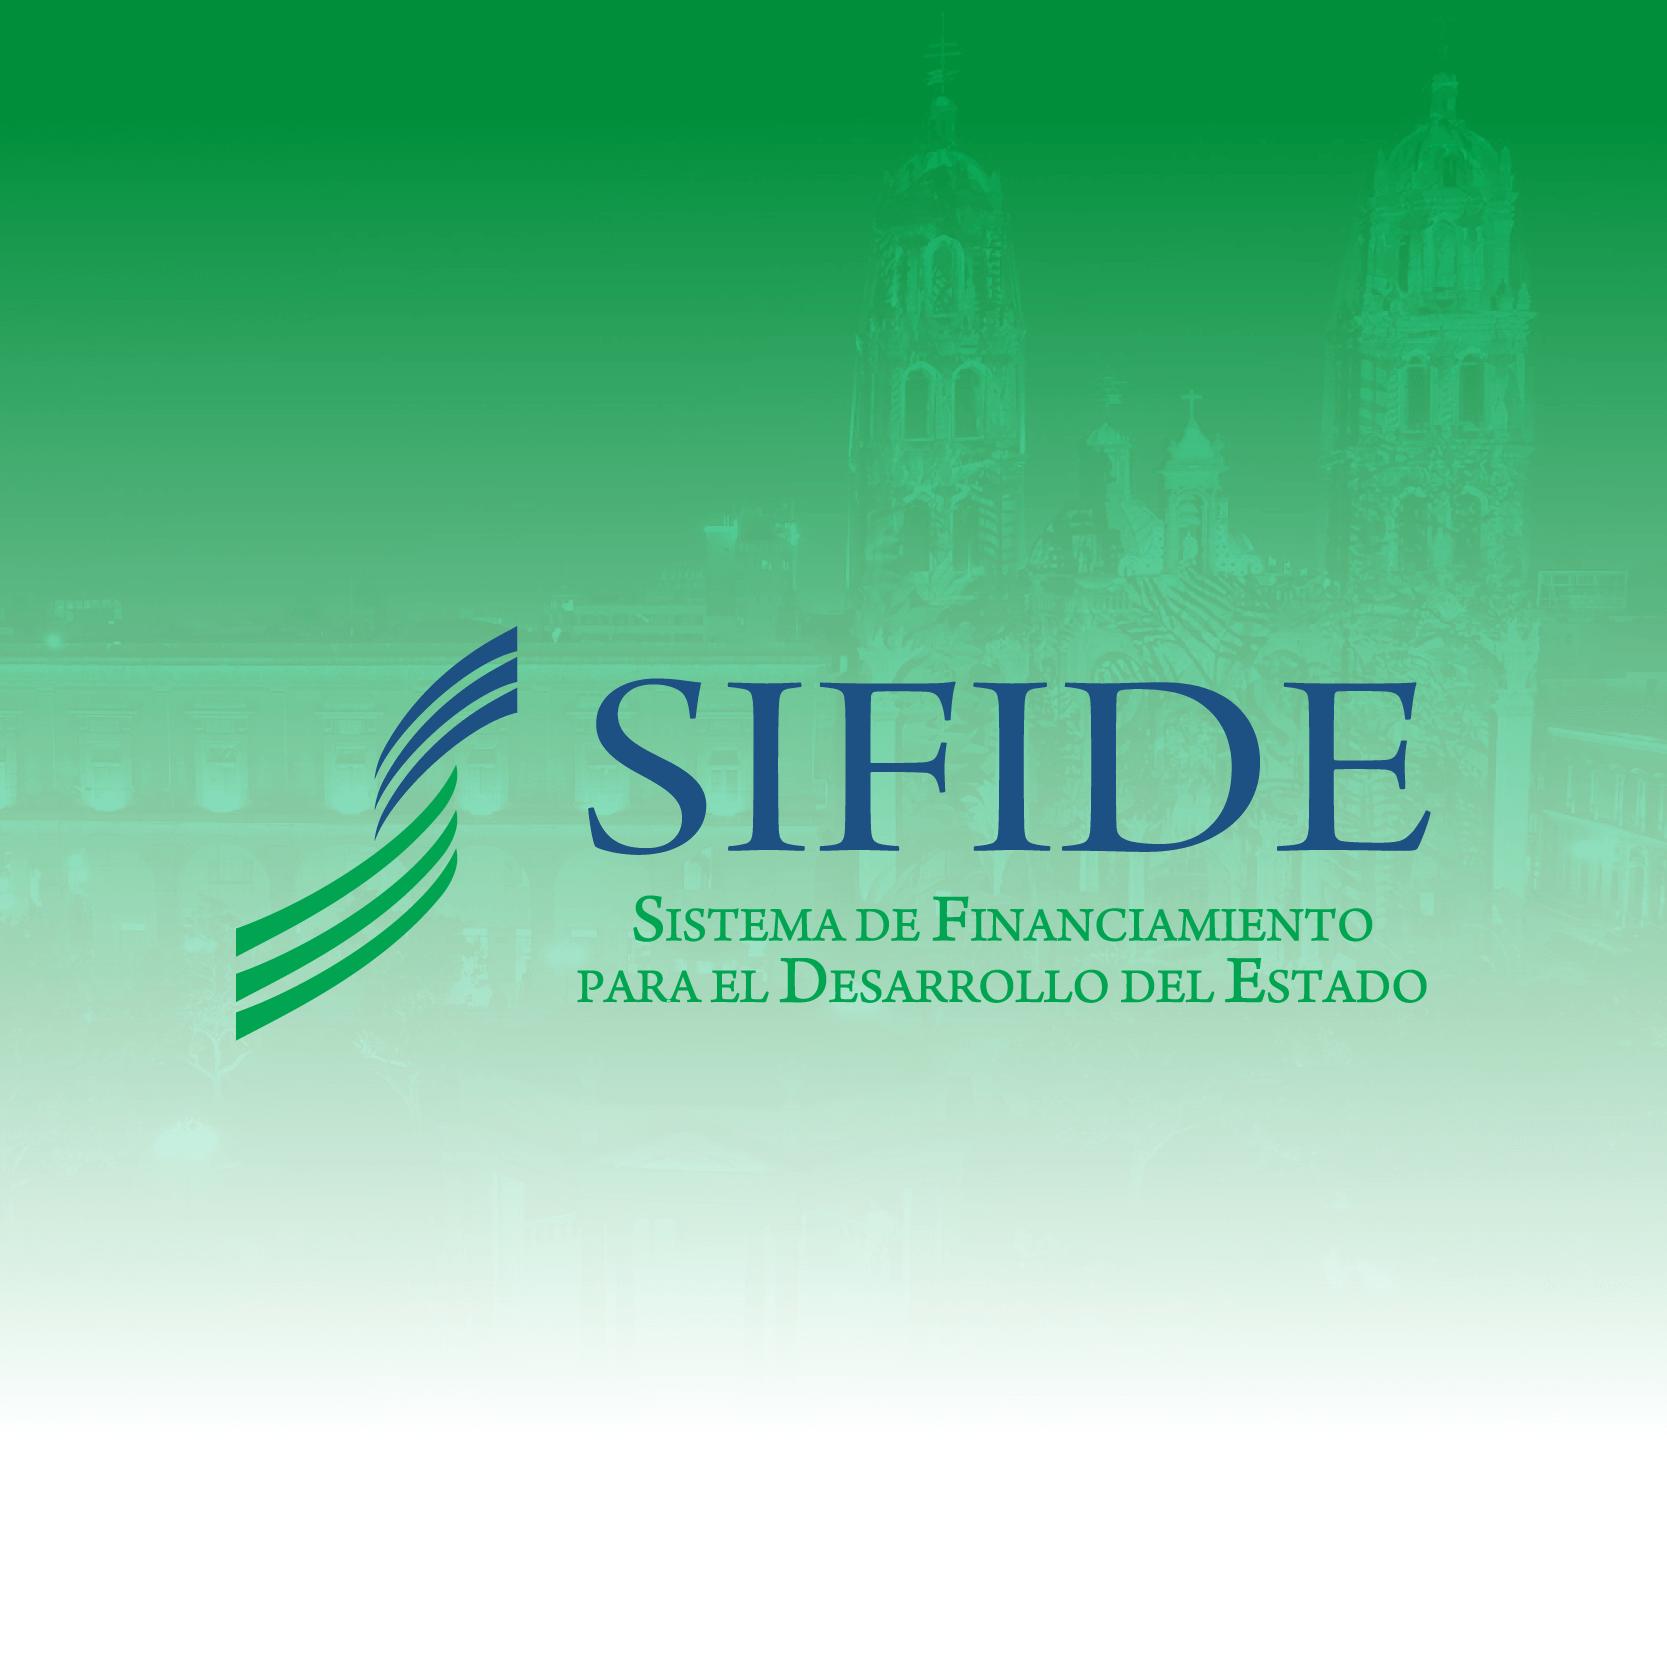 sifide-slider-02